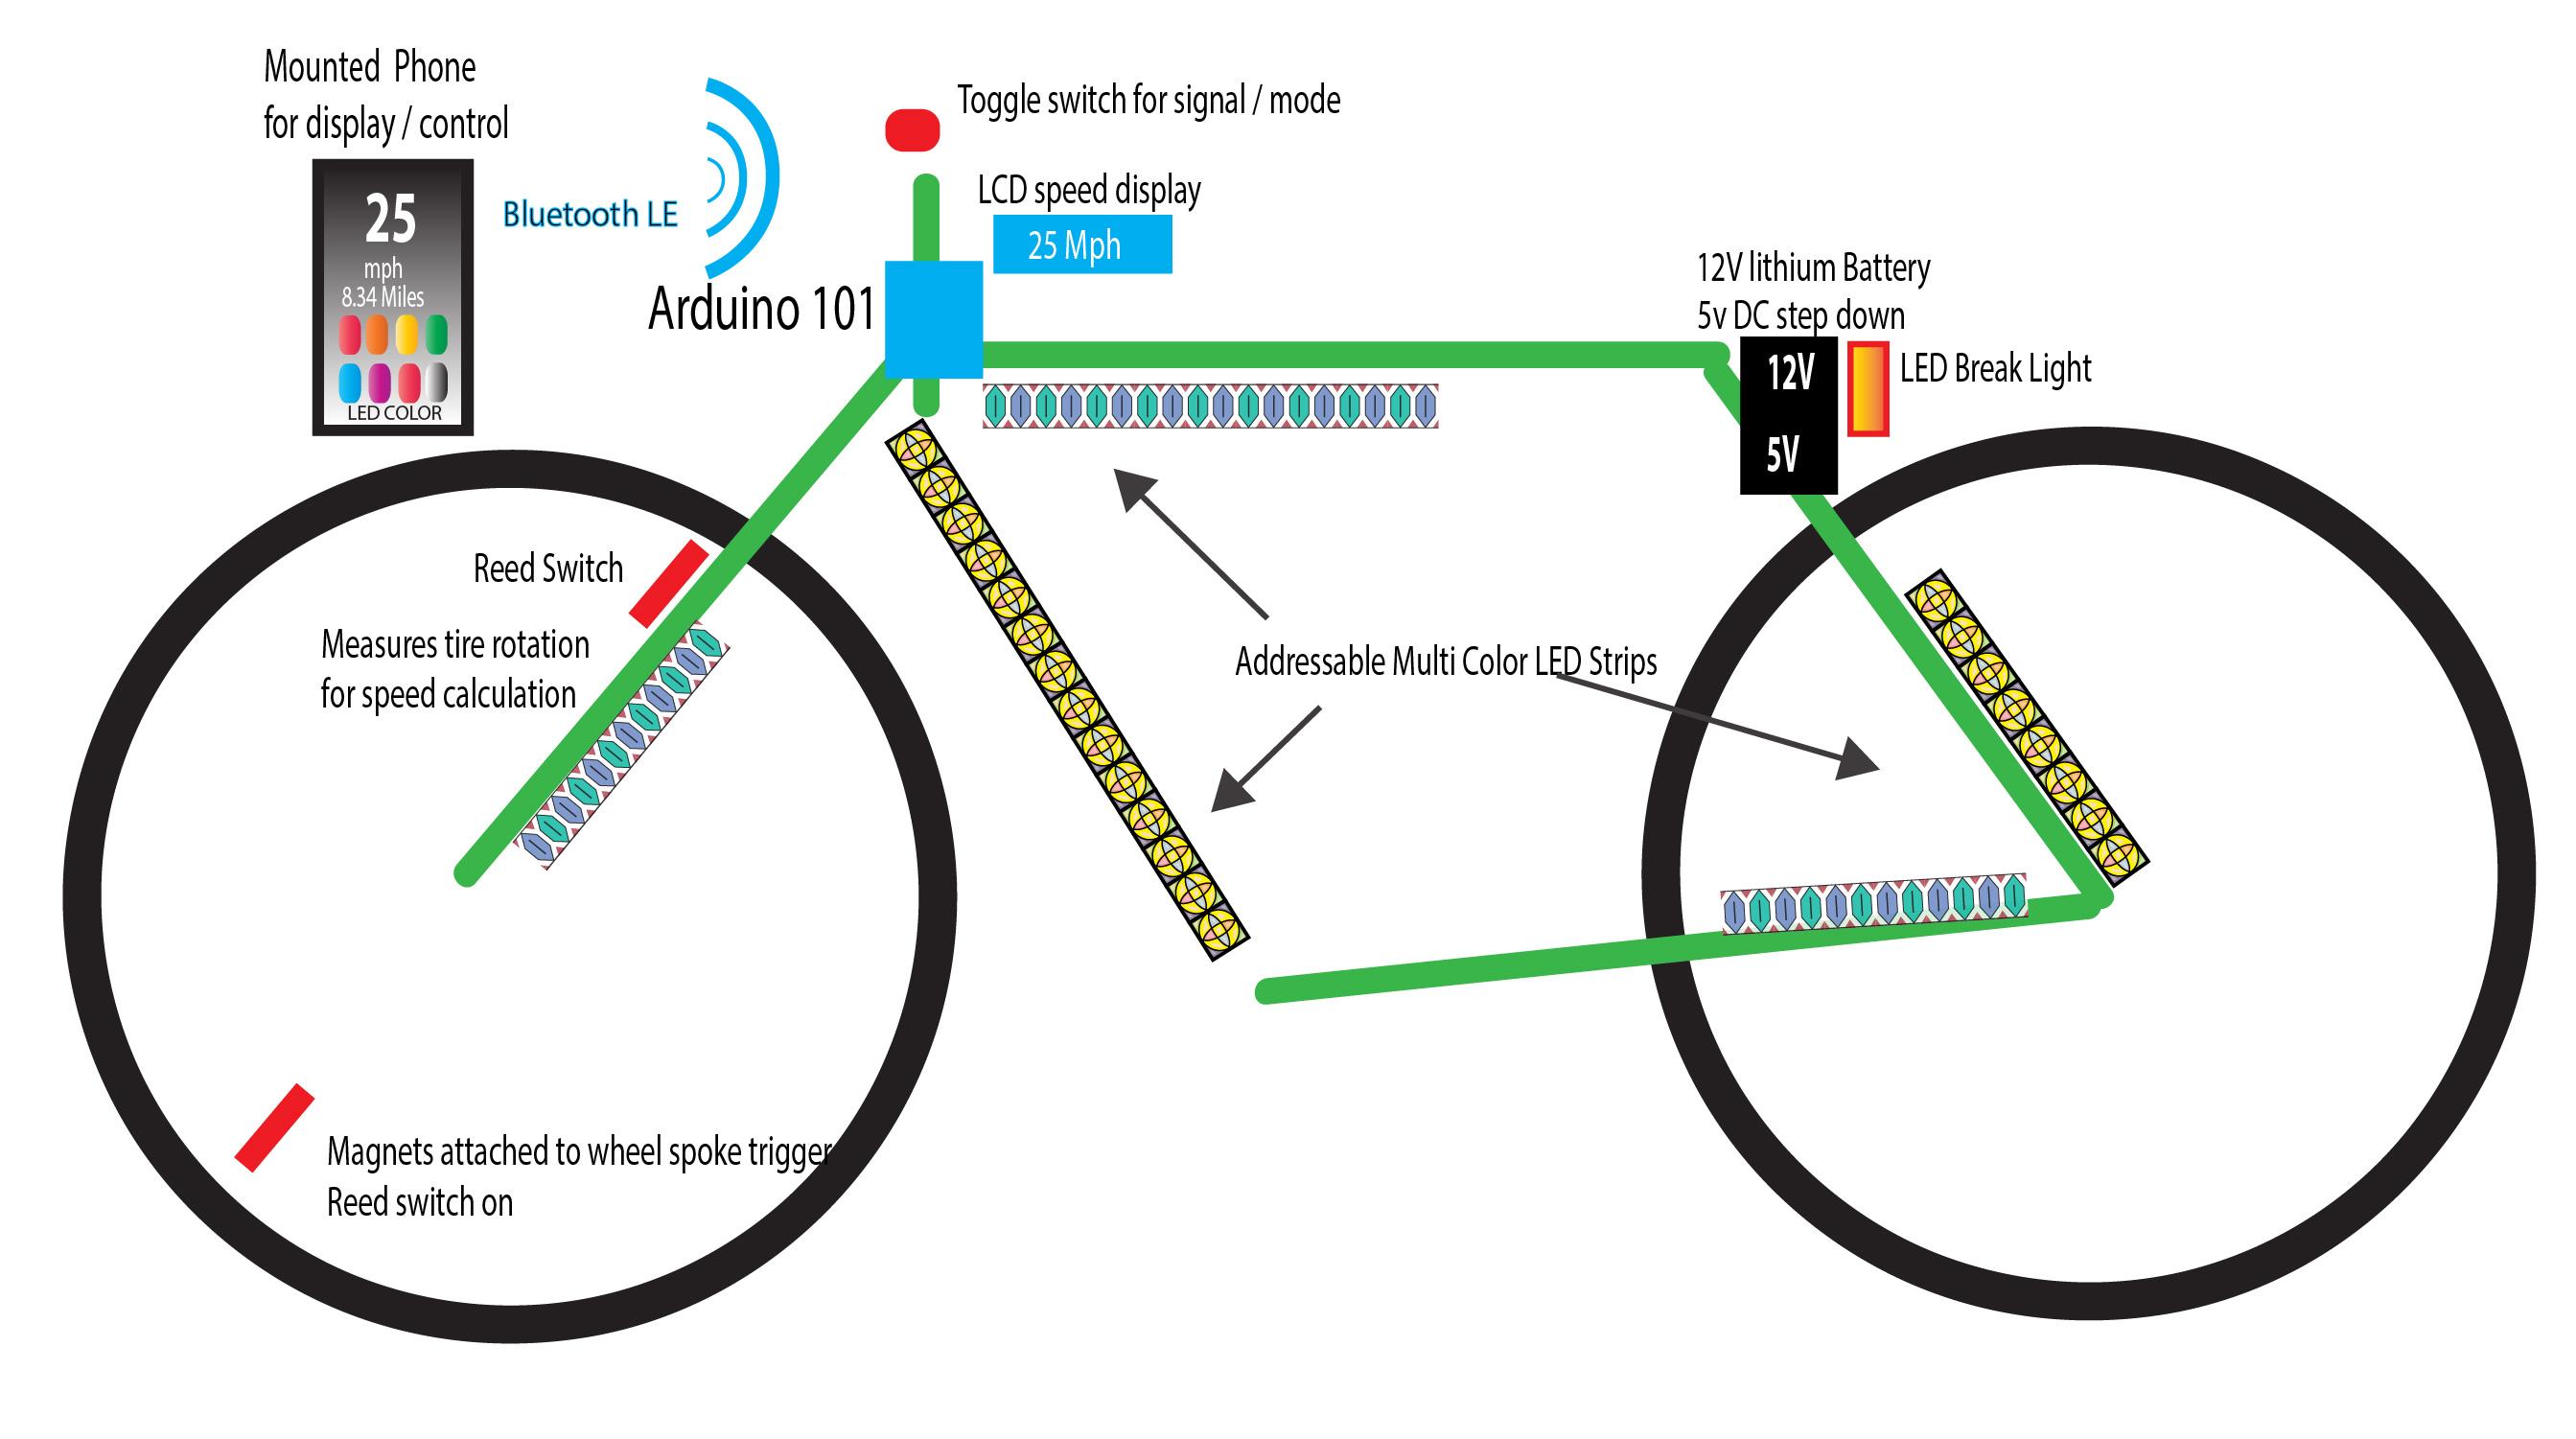 hight resolution of 12v led wiring diagram tir4 wiring diagram pdf 12v led wiring diagram tir4